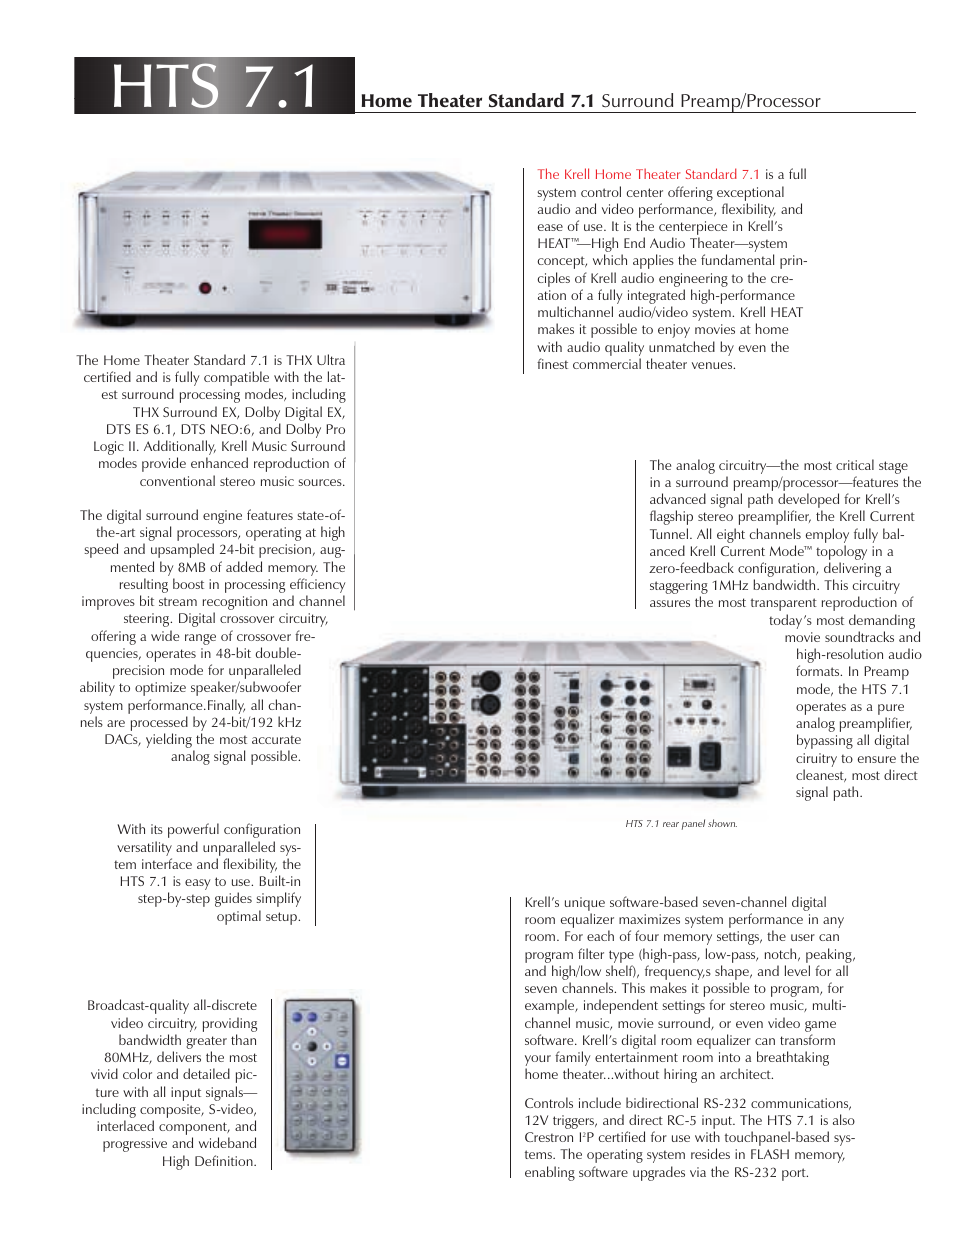 Krell service manuals & schematics pdfs on dvd huge collection.